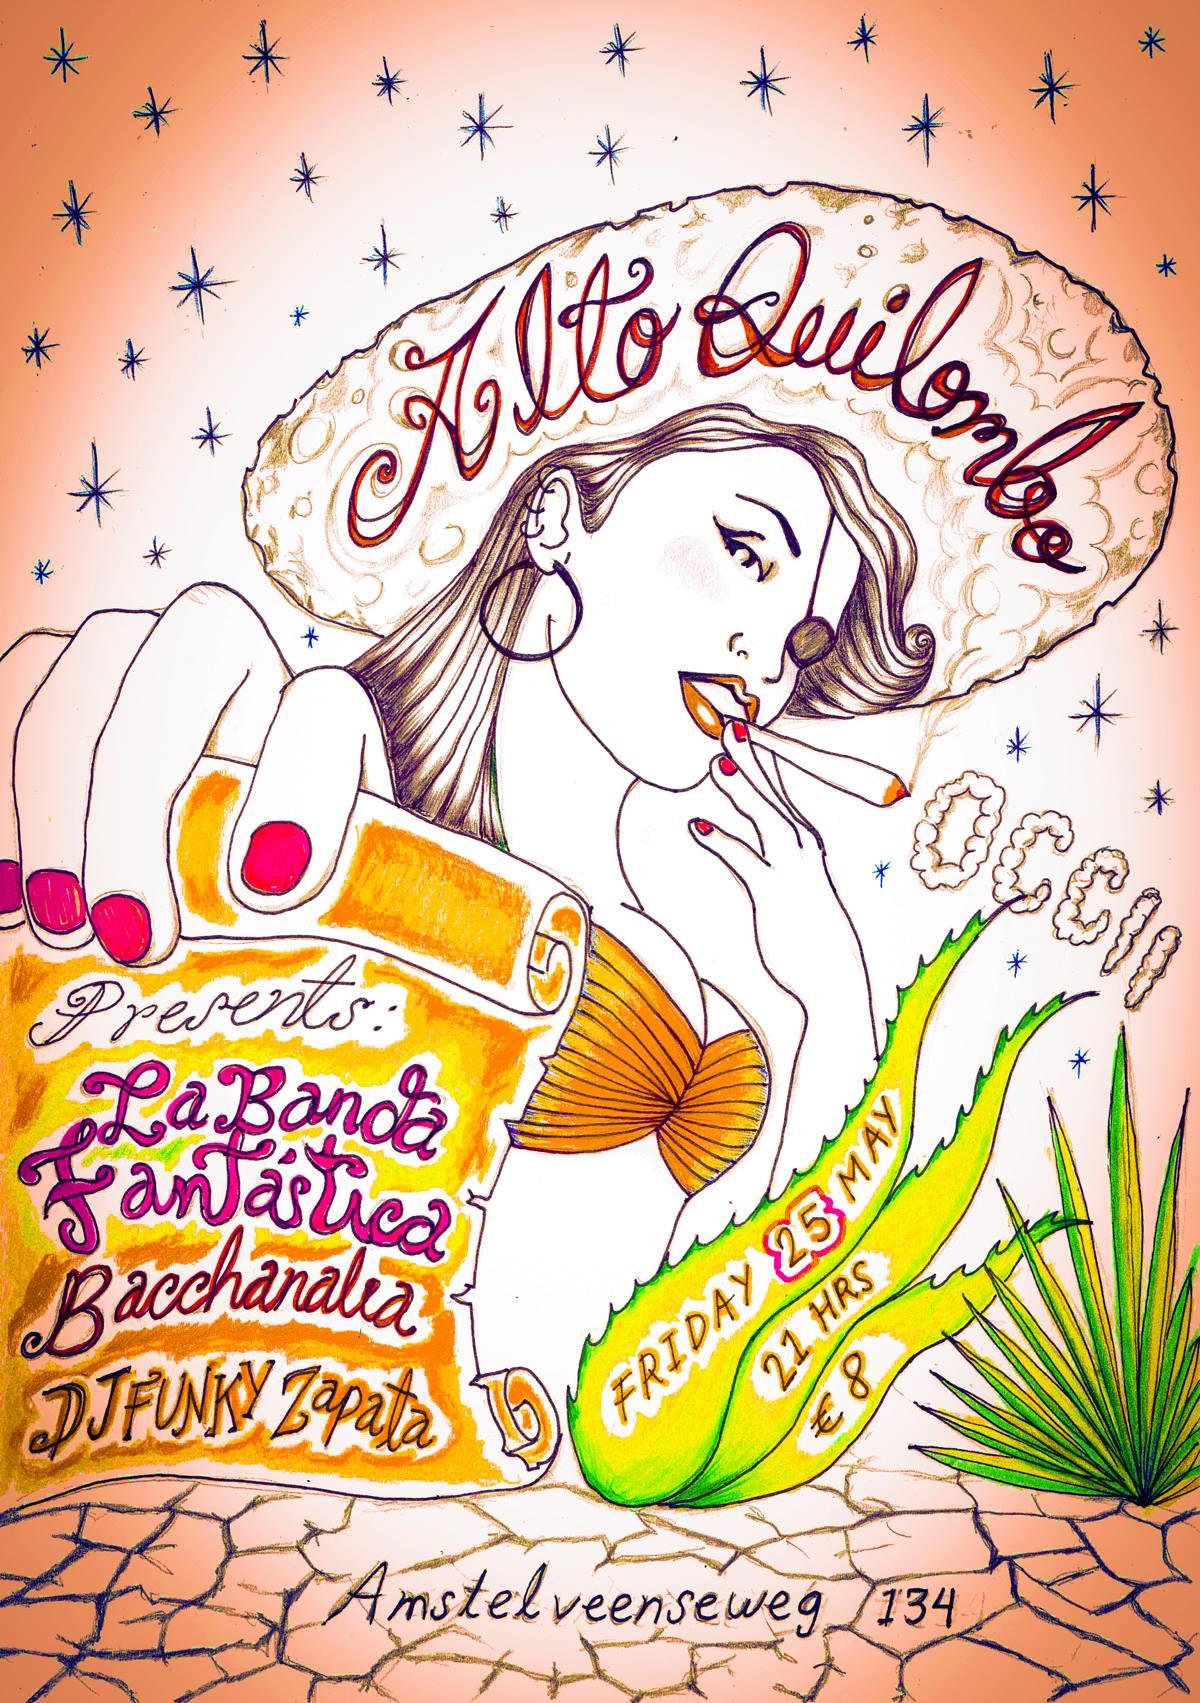 Alto Quilombo present: LA BANDA FANTÁSTICA + BACCHANALIA + DJ FUNKY ZAPATA